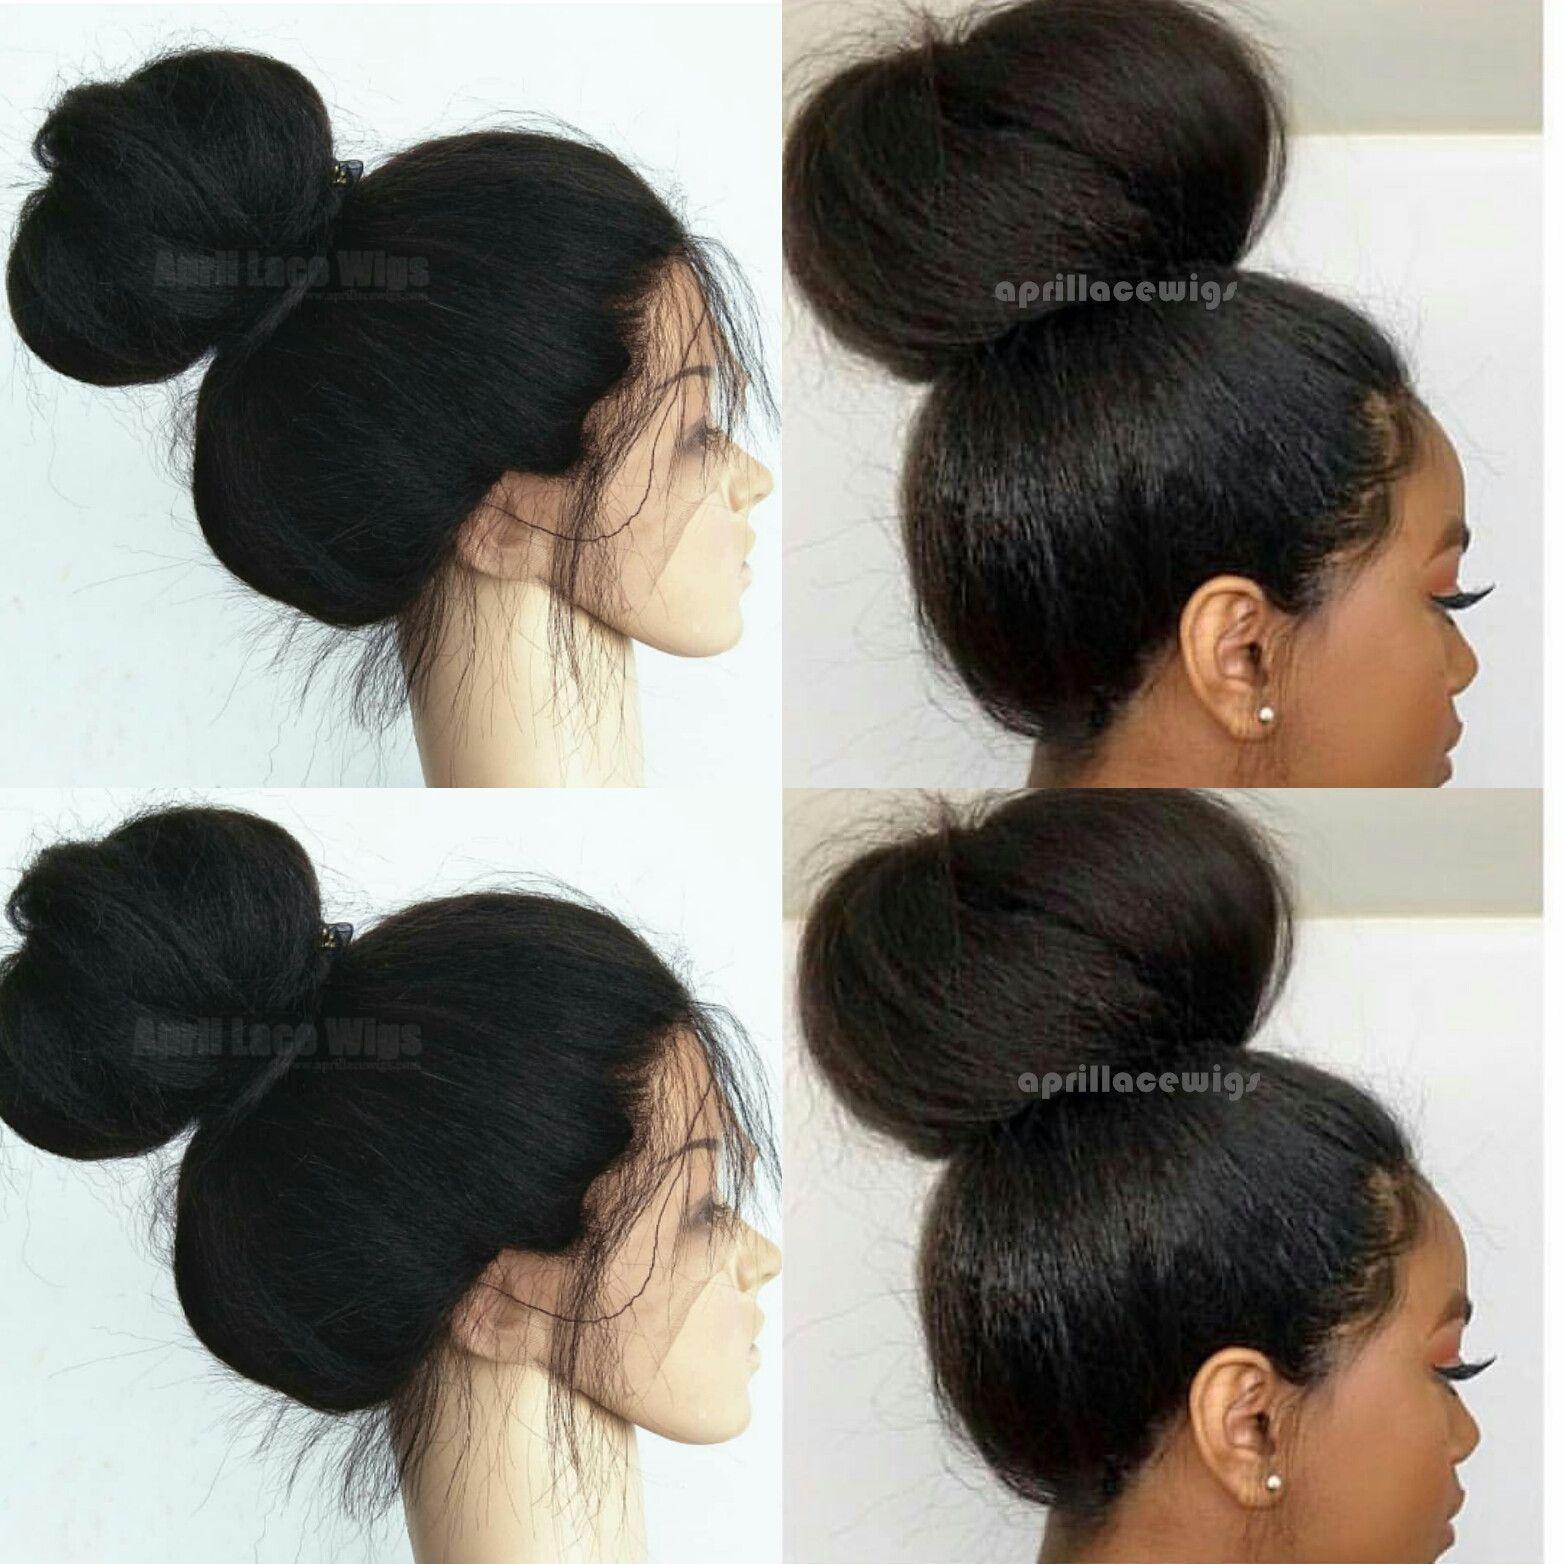 Italian Yaki Full Lace Wig Make A Bun Beautiful Style Italianyakiwig Fullacewigs Lacewigs Aprillacewigs Full Lace Wig Lace Wigs Braids For Black Hair